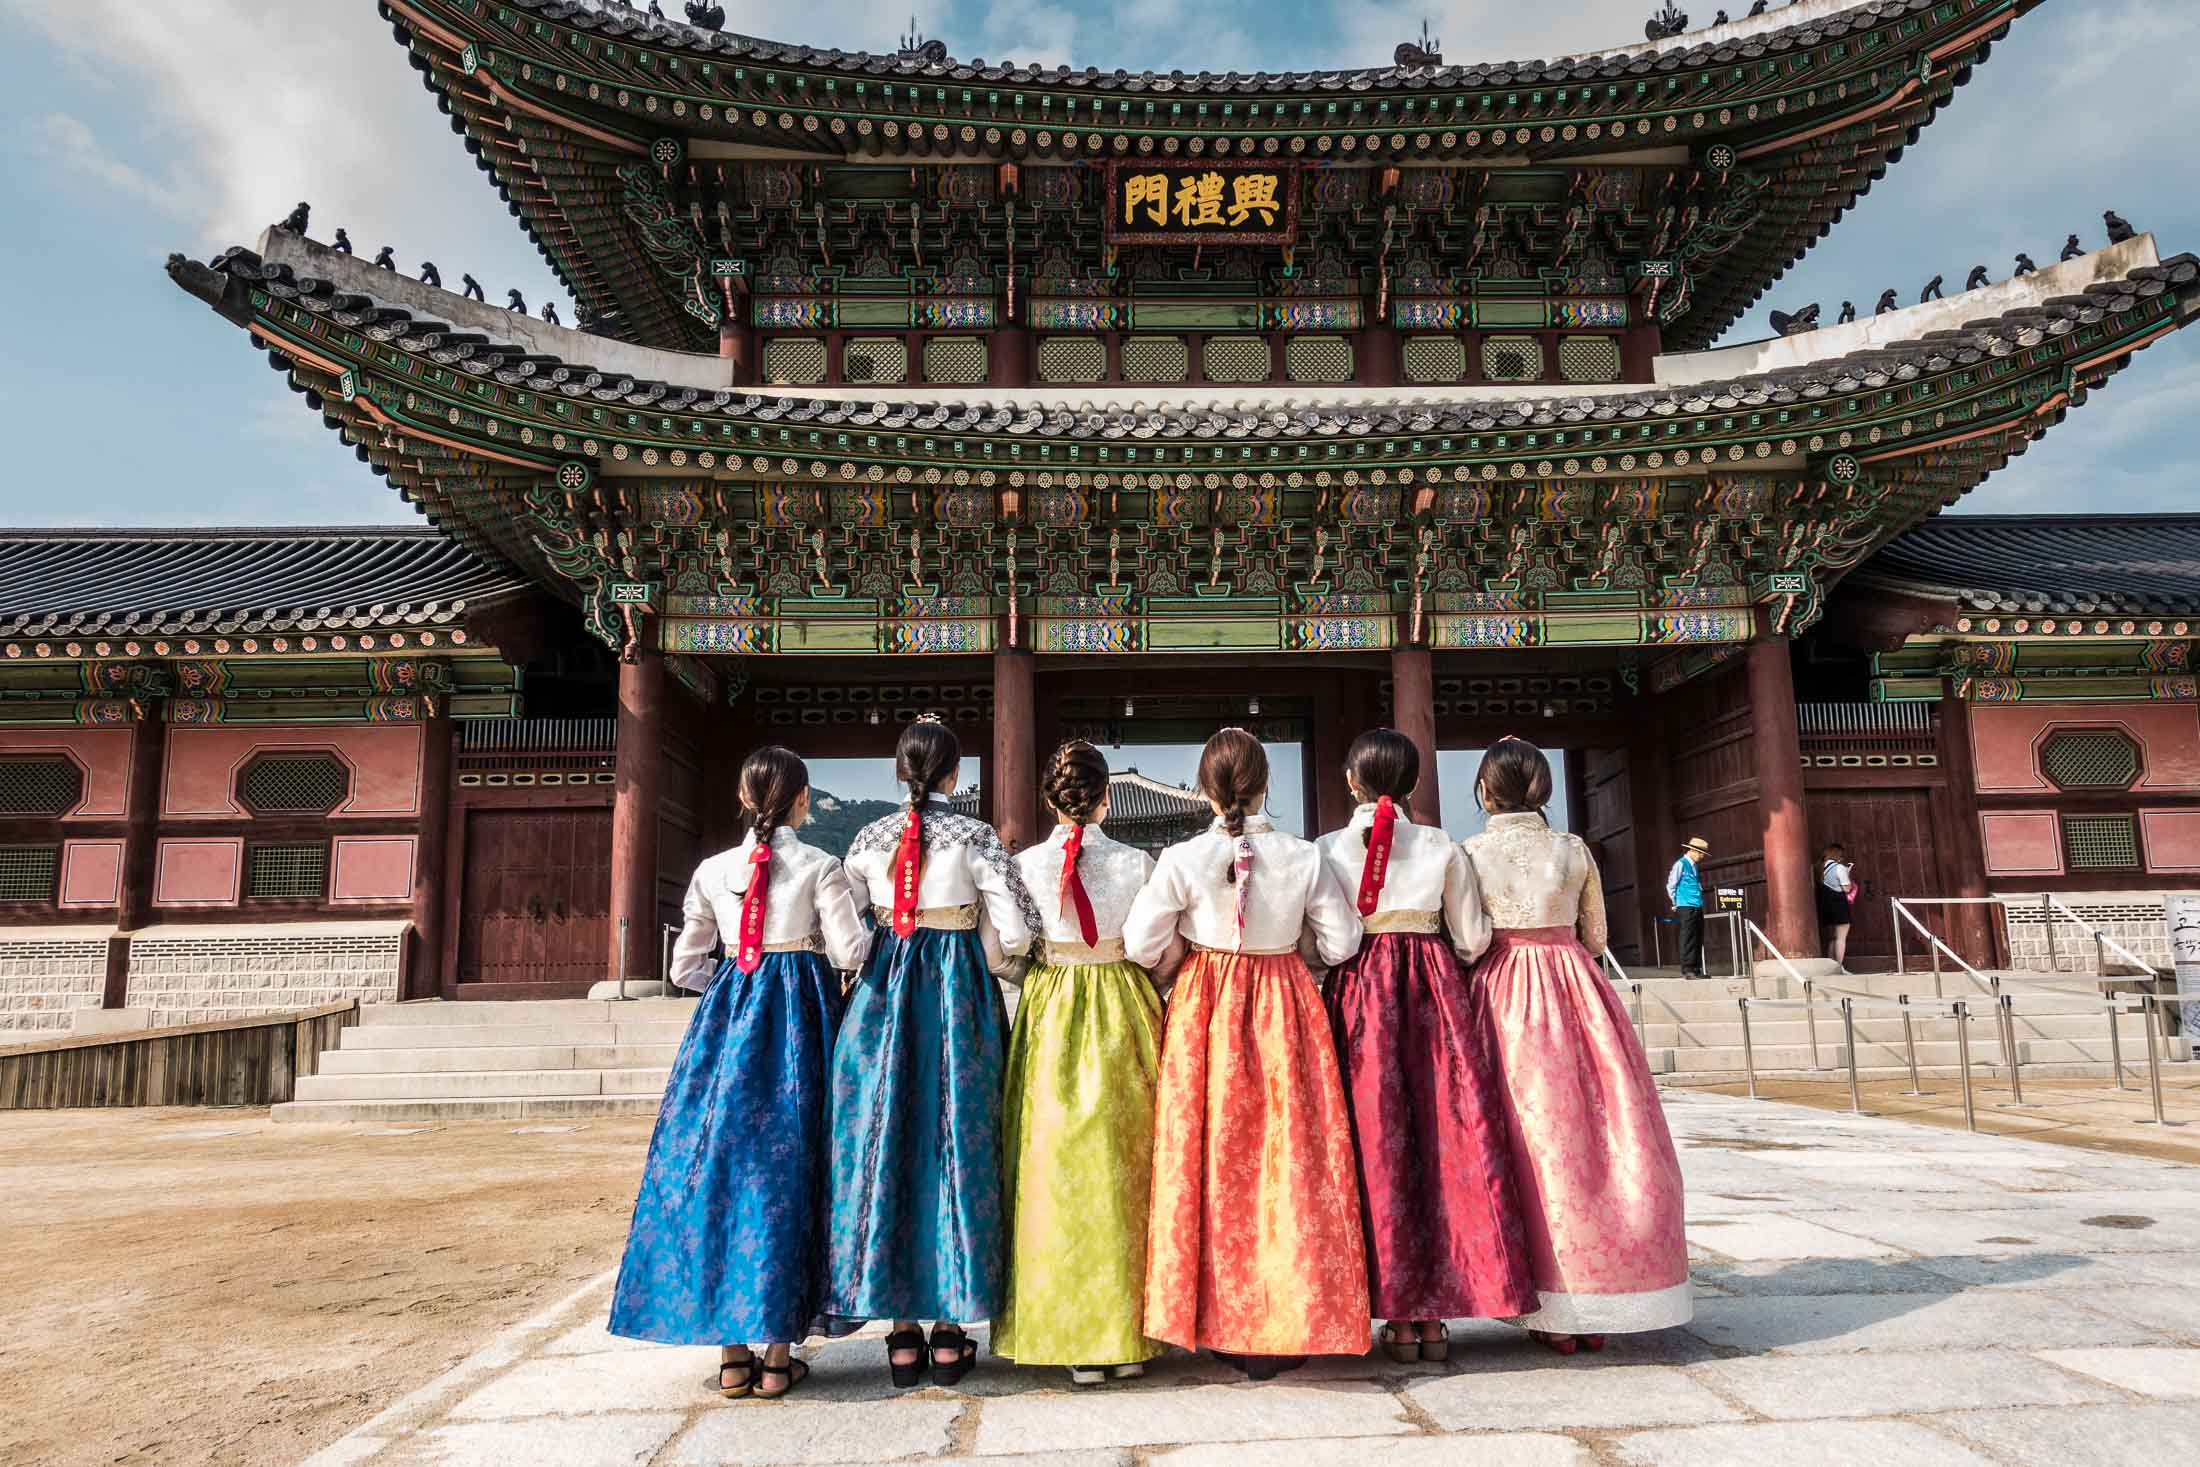 Gyeongbokgung Palace via travelpast50.com